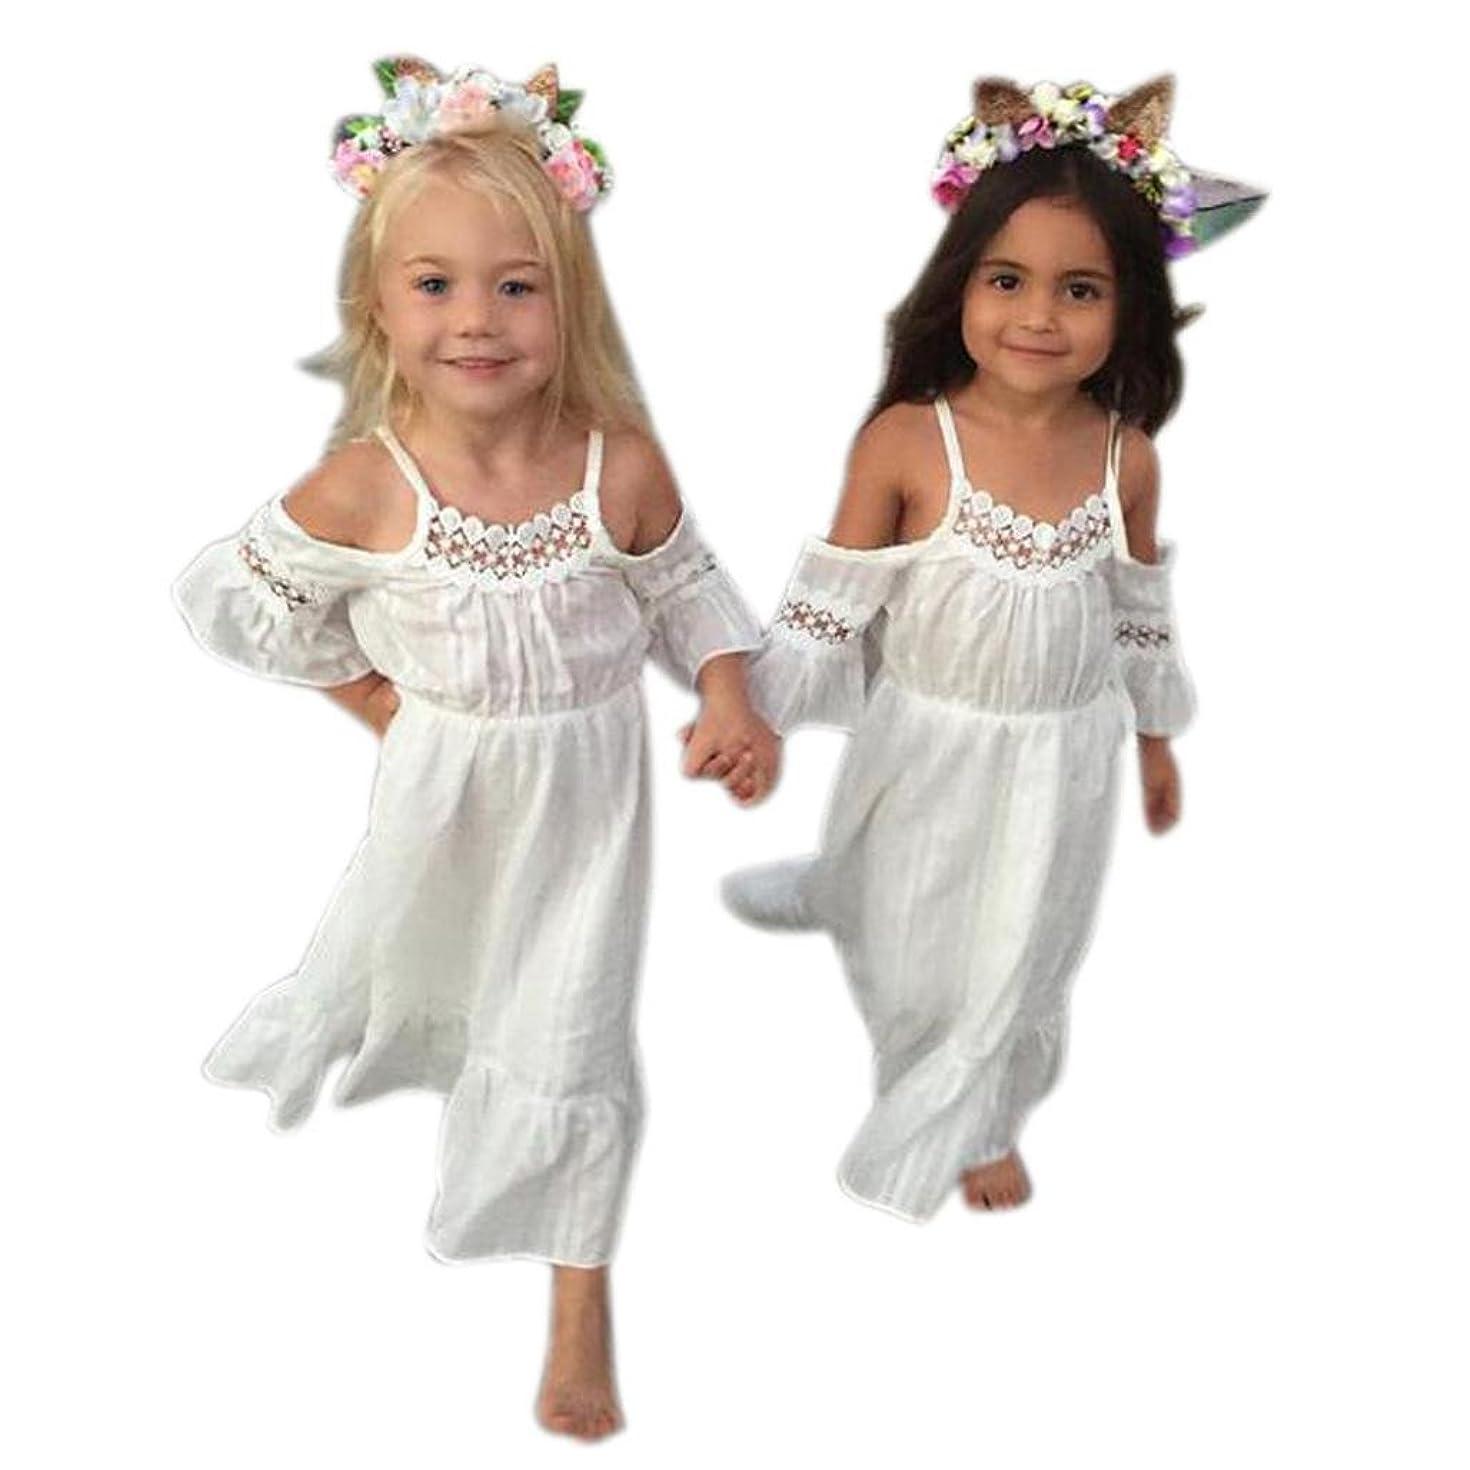 Hemlock Baby Little Girl Long Dress Lace Off Shoulder Wedding Party Dress (5T, White)